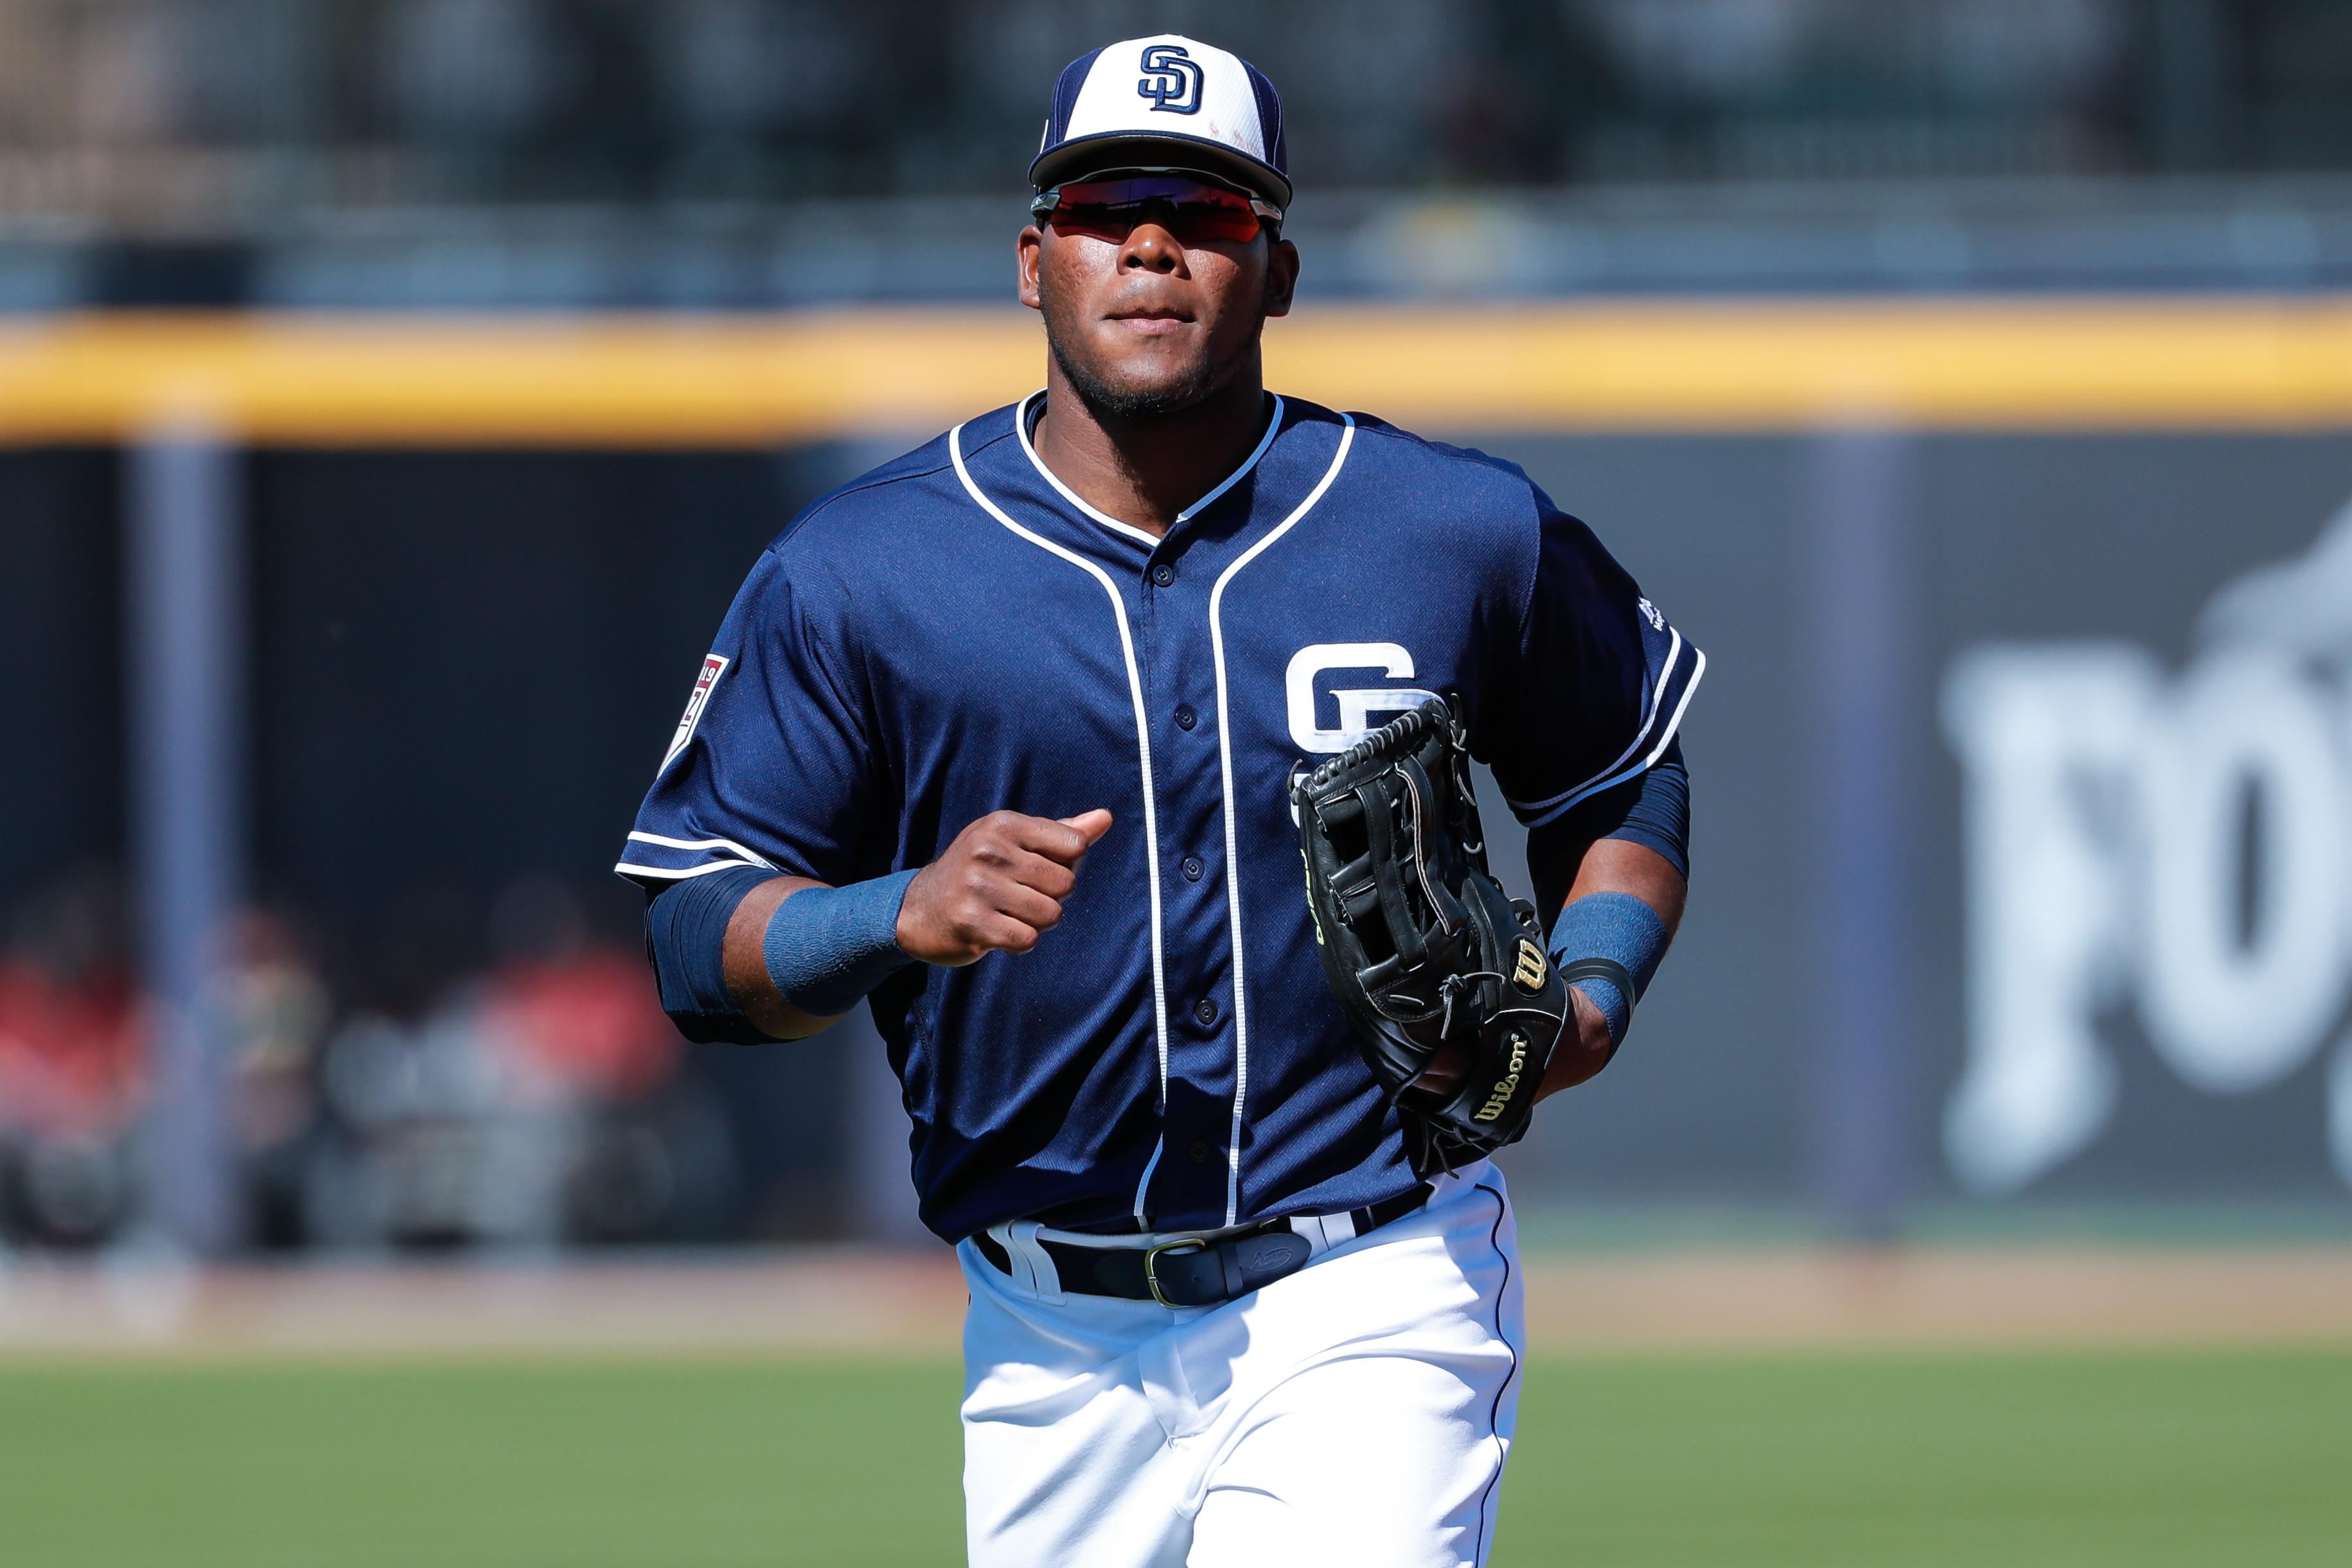 MLB: FEB 27 Spring Training - Diamondbacks at Padres